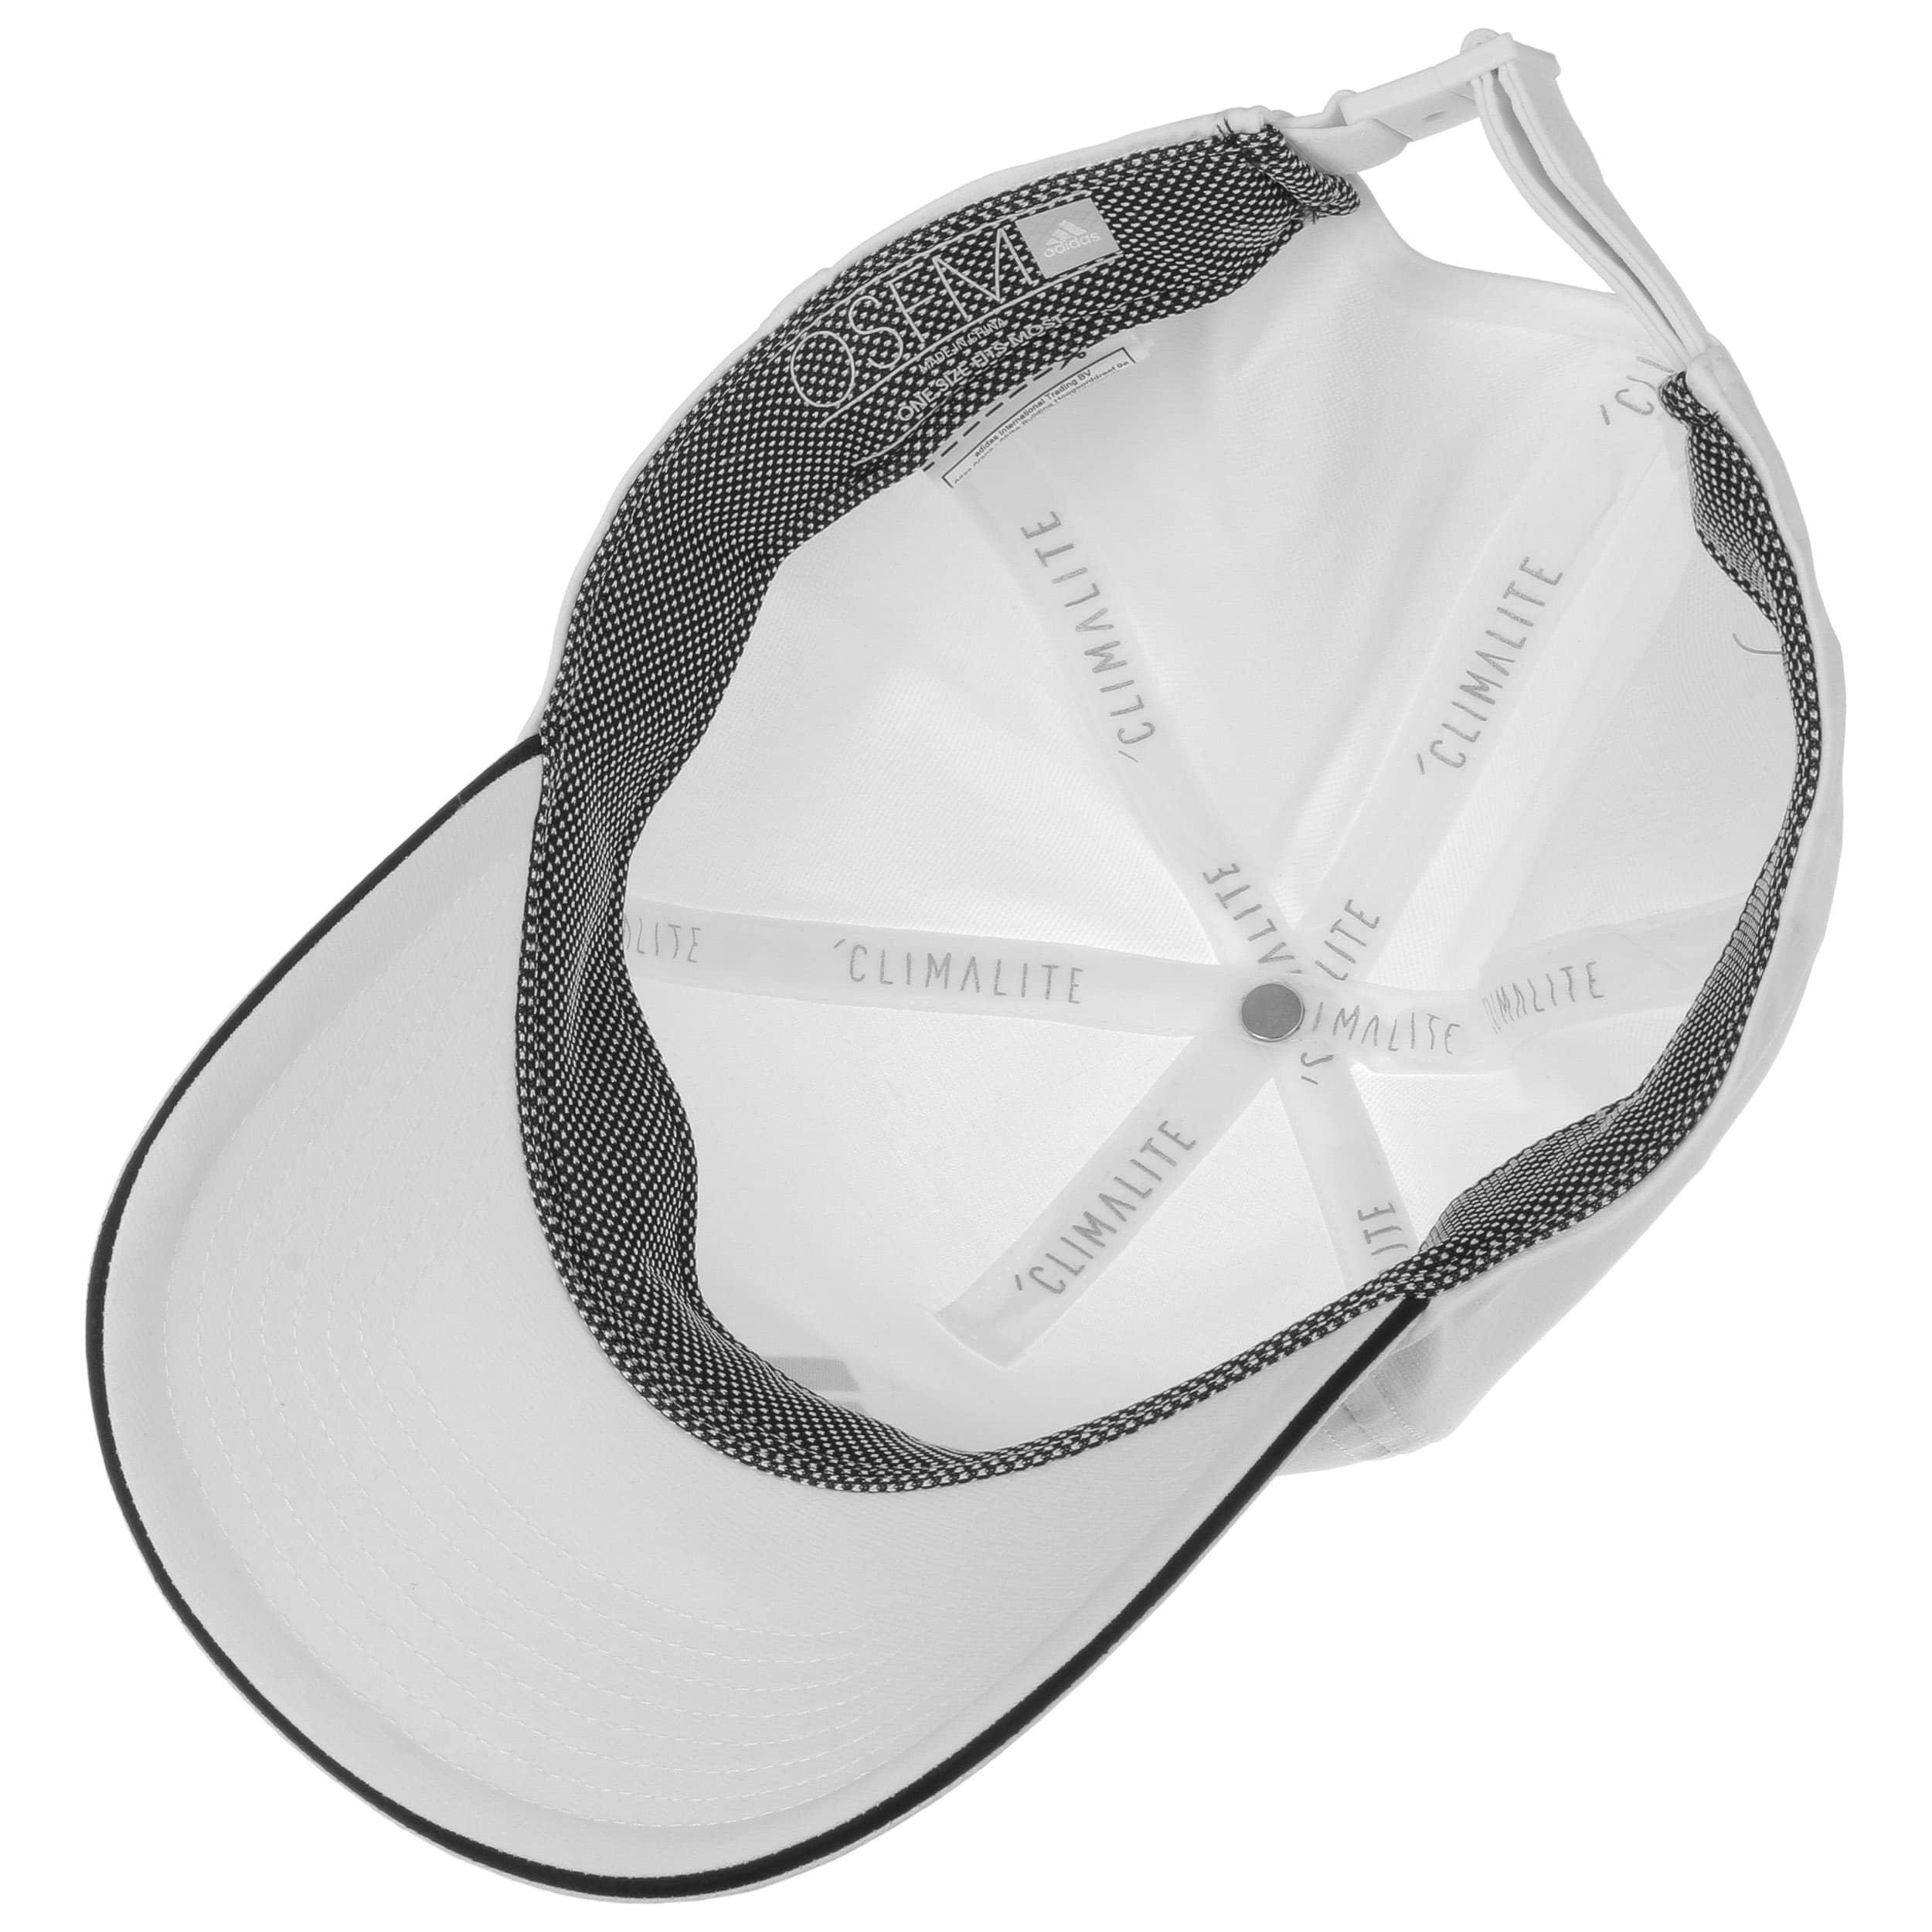 ... C40 5P Climalite Cap by adidas - white 2 ... 1ddfbf9abd5